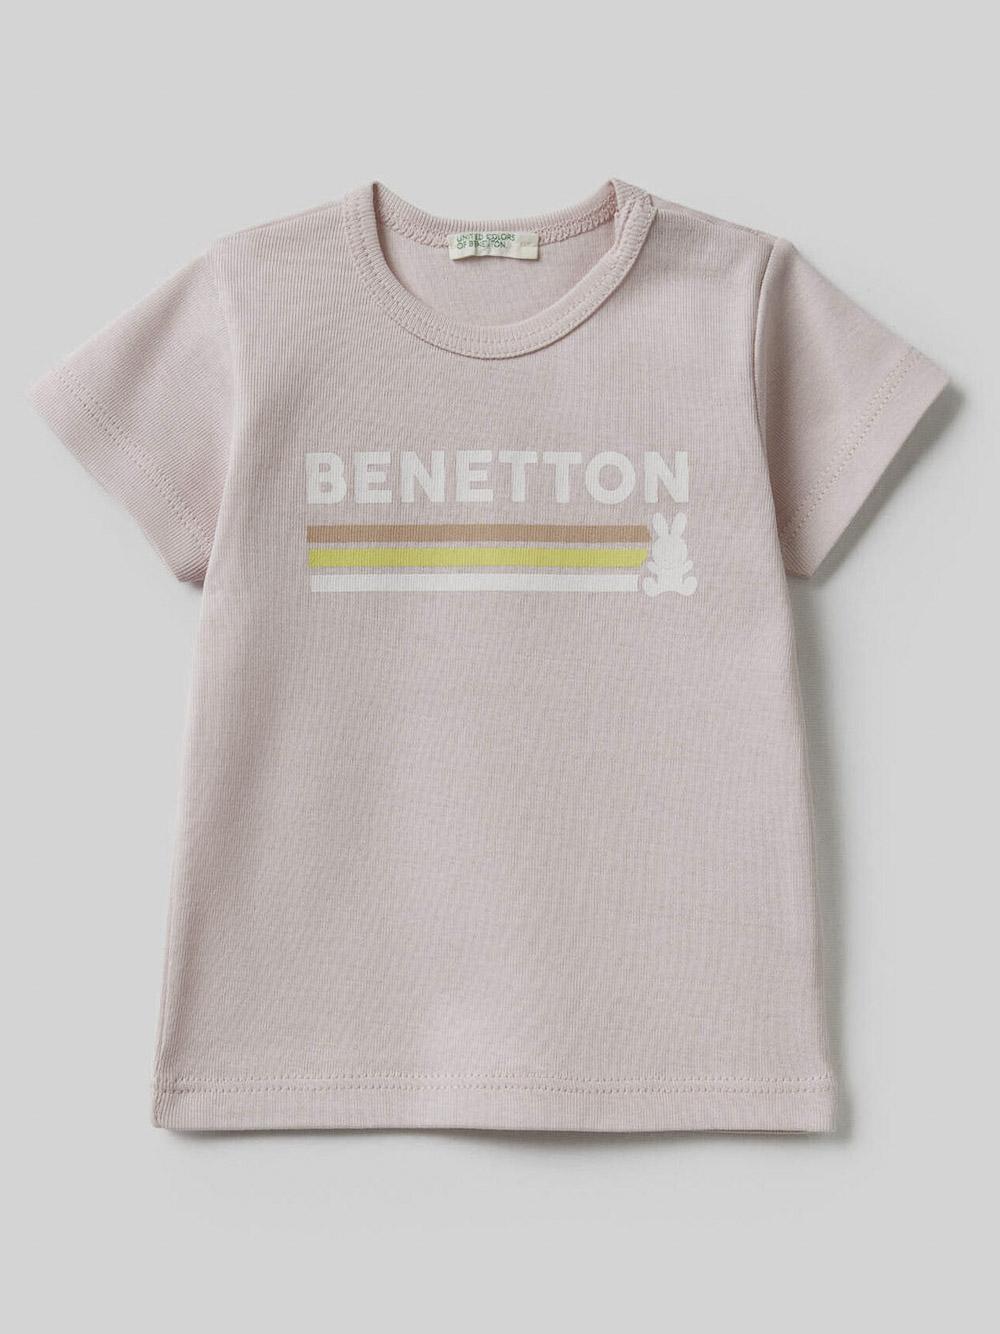 012 BENETTON T-SHIRT W 3I9WMM28H 21P0B4